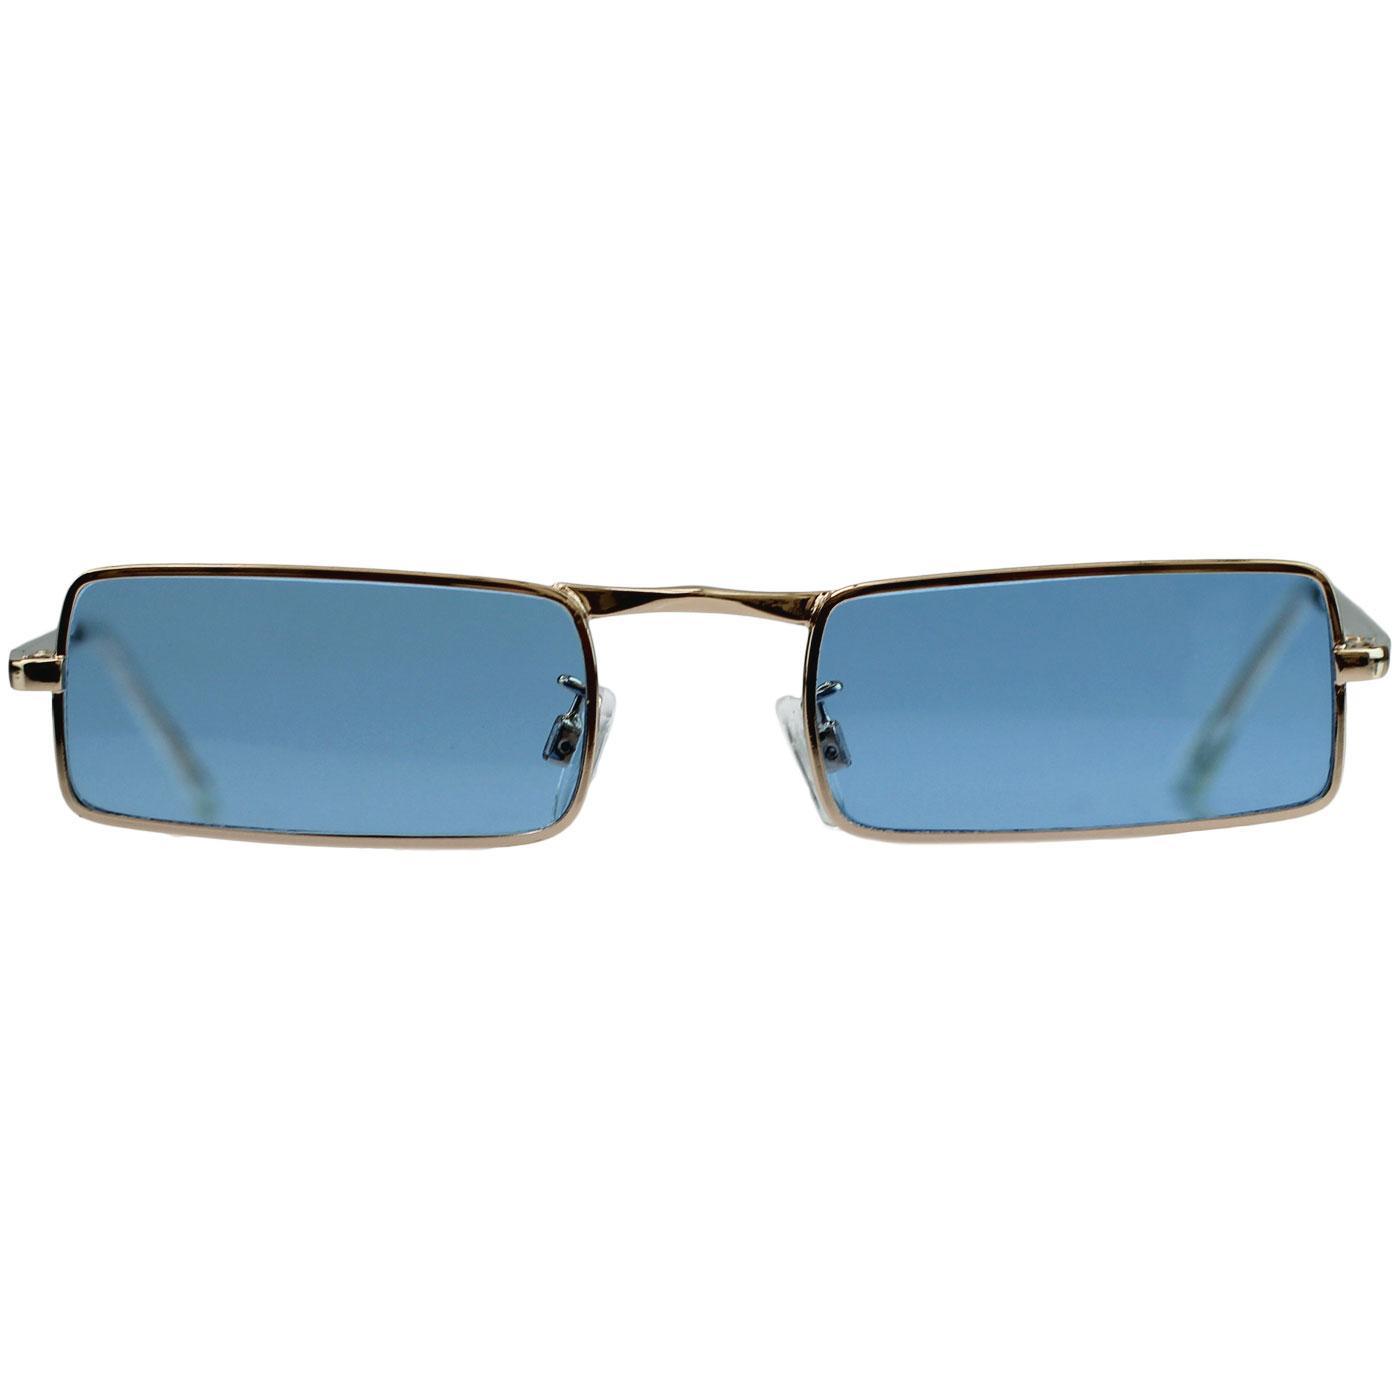 McGuinn MADCAP ENGLAND 1960s Granny Glasses BLUE